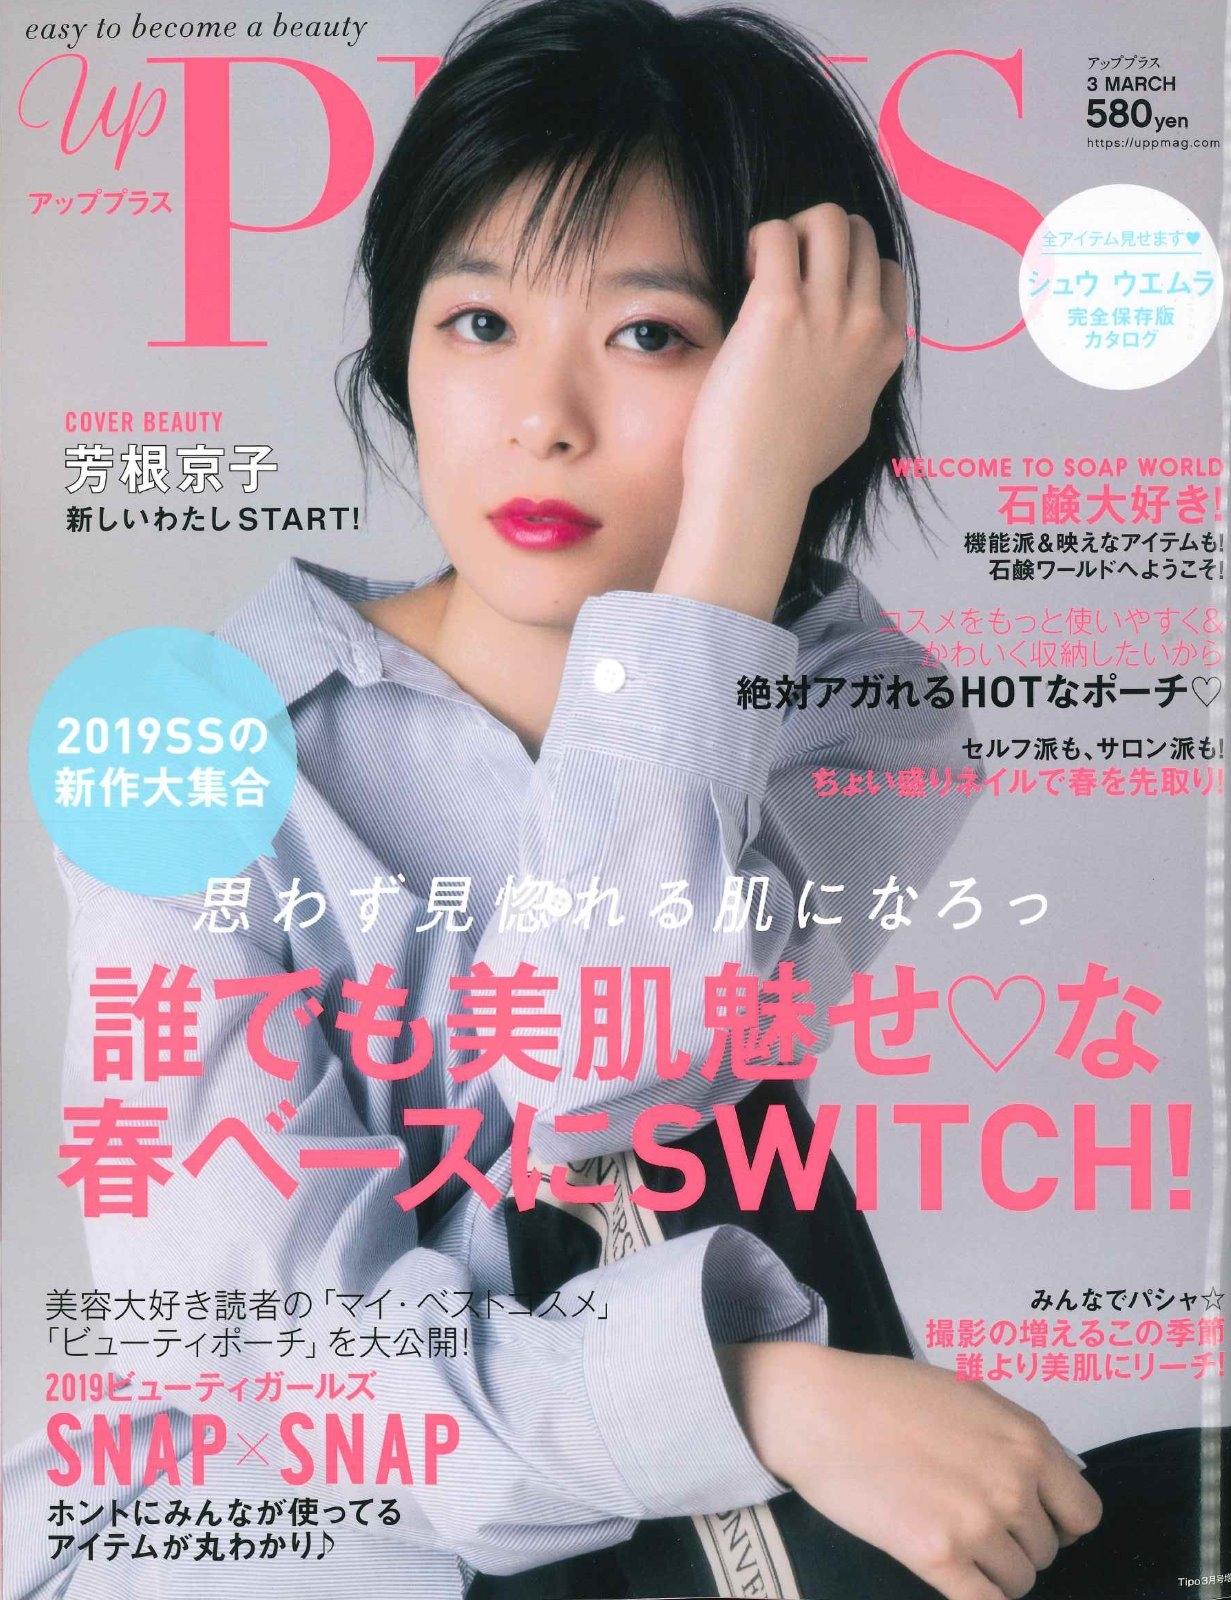 【upPLUS】3月号掲載情報